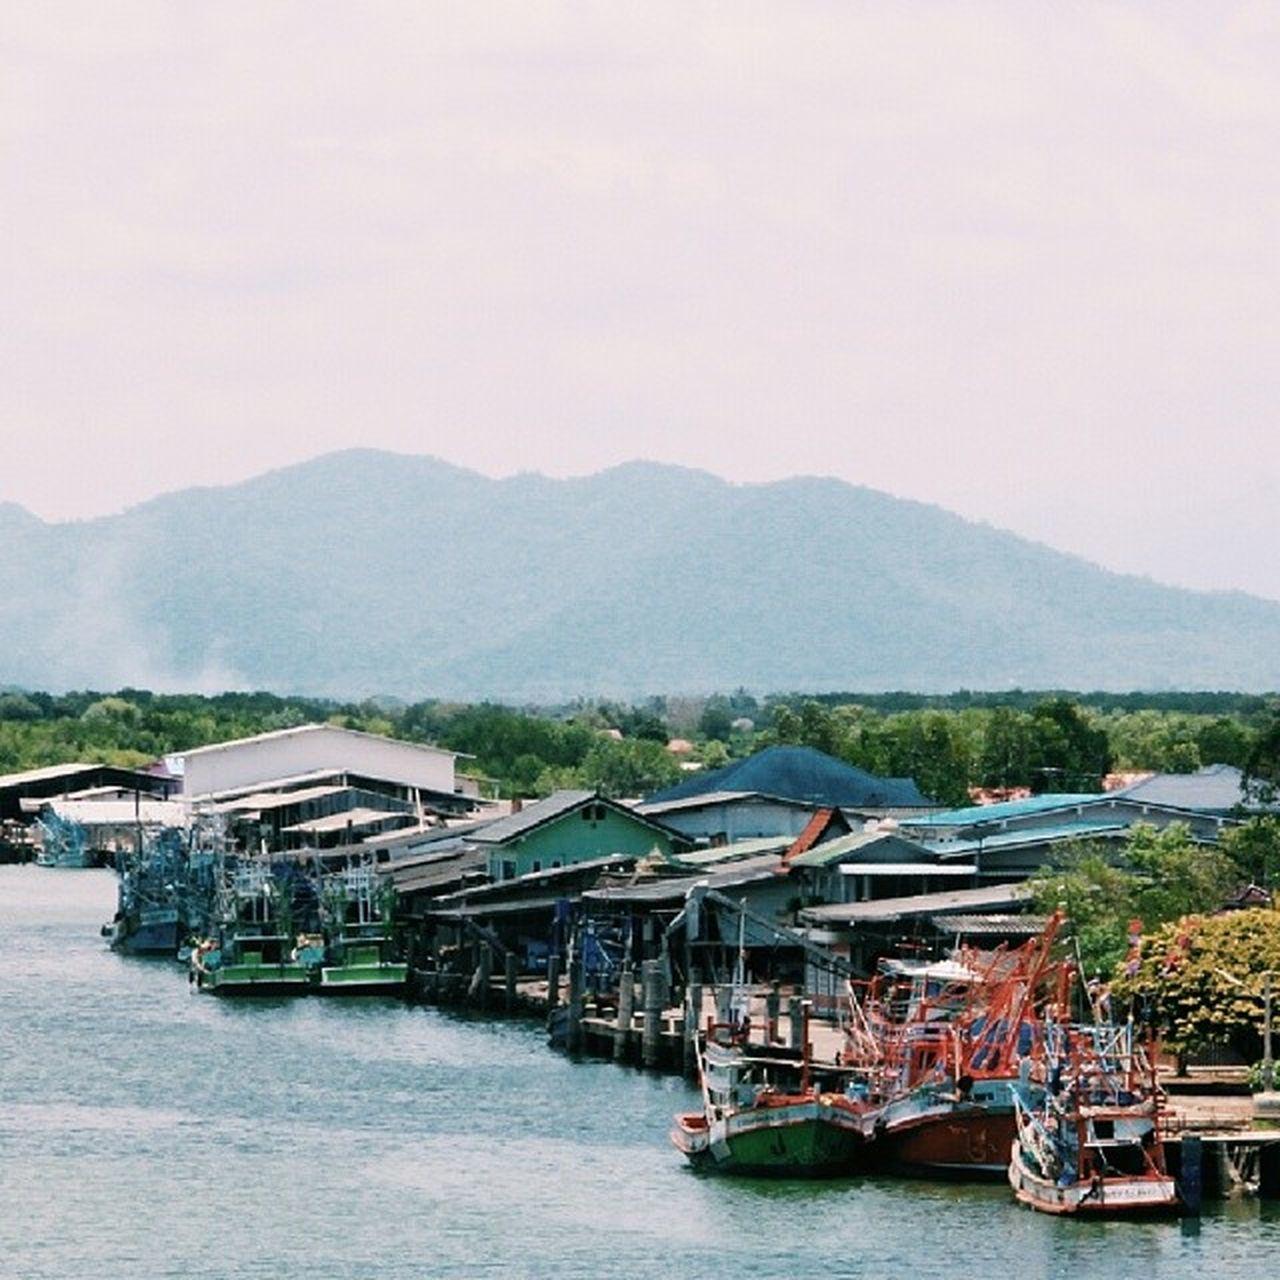 JANTABULEE , THAILAND -ชีวิตริมแม่น้ำลำนำภูเขา- ถ่ายจากบนสะพานตากสิน จ.จันทบุรี ภาพที่ยังไม่ได้ลง